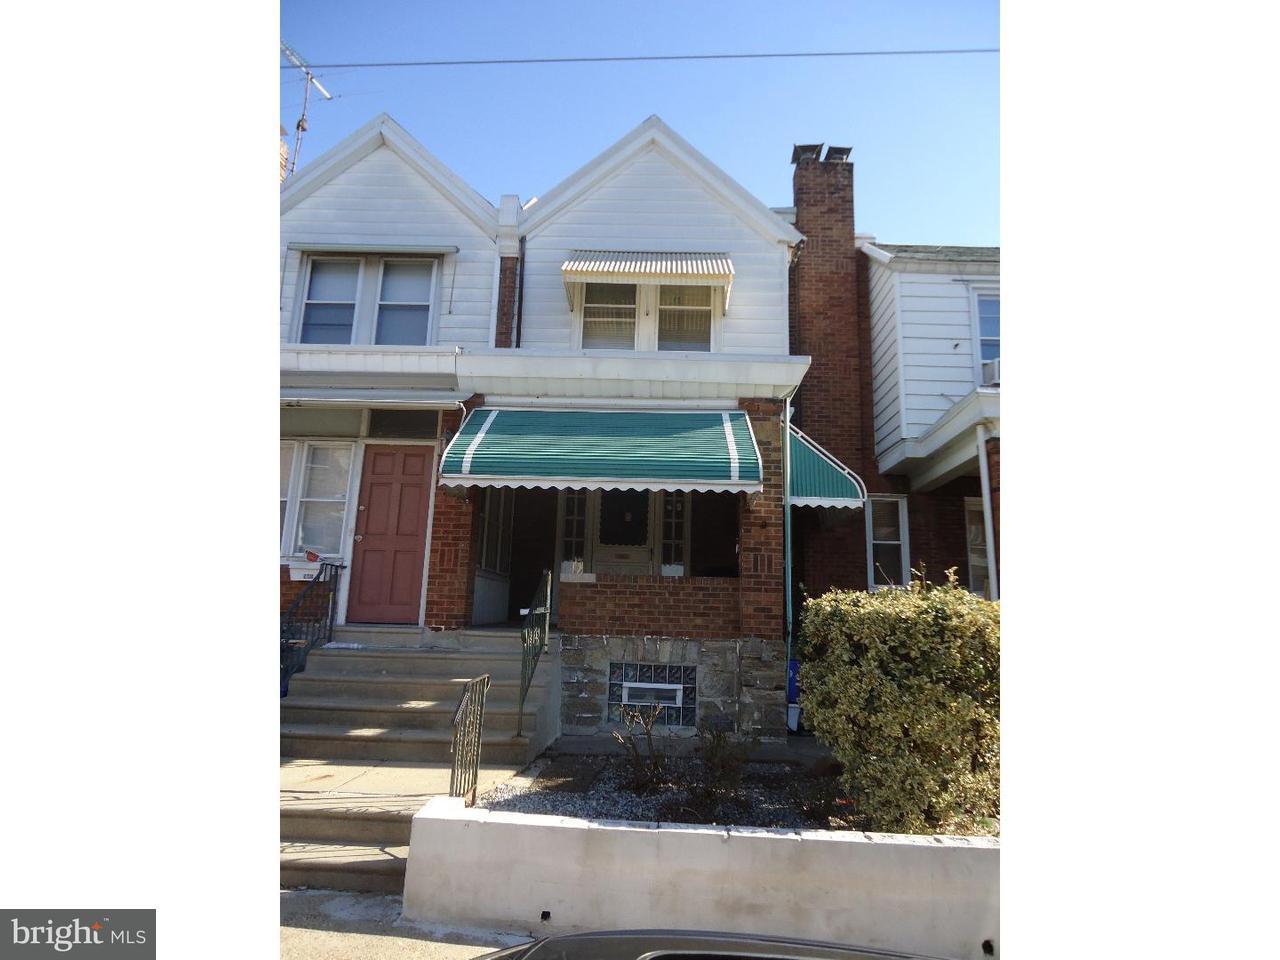 6043 N 3RD Philadelphia , PA 19120